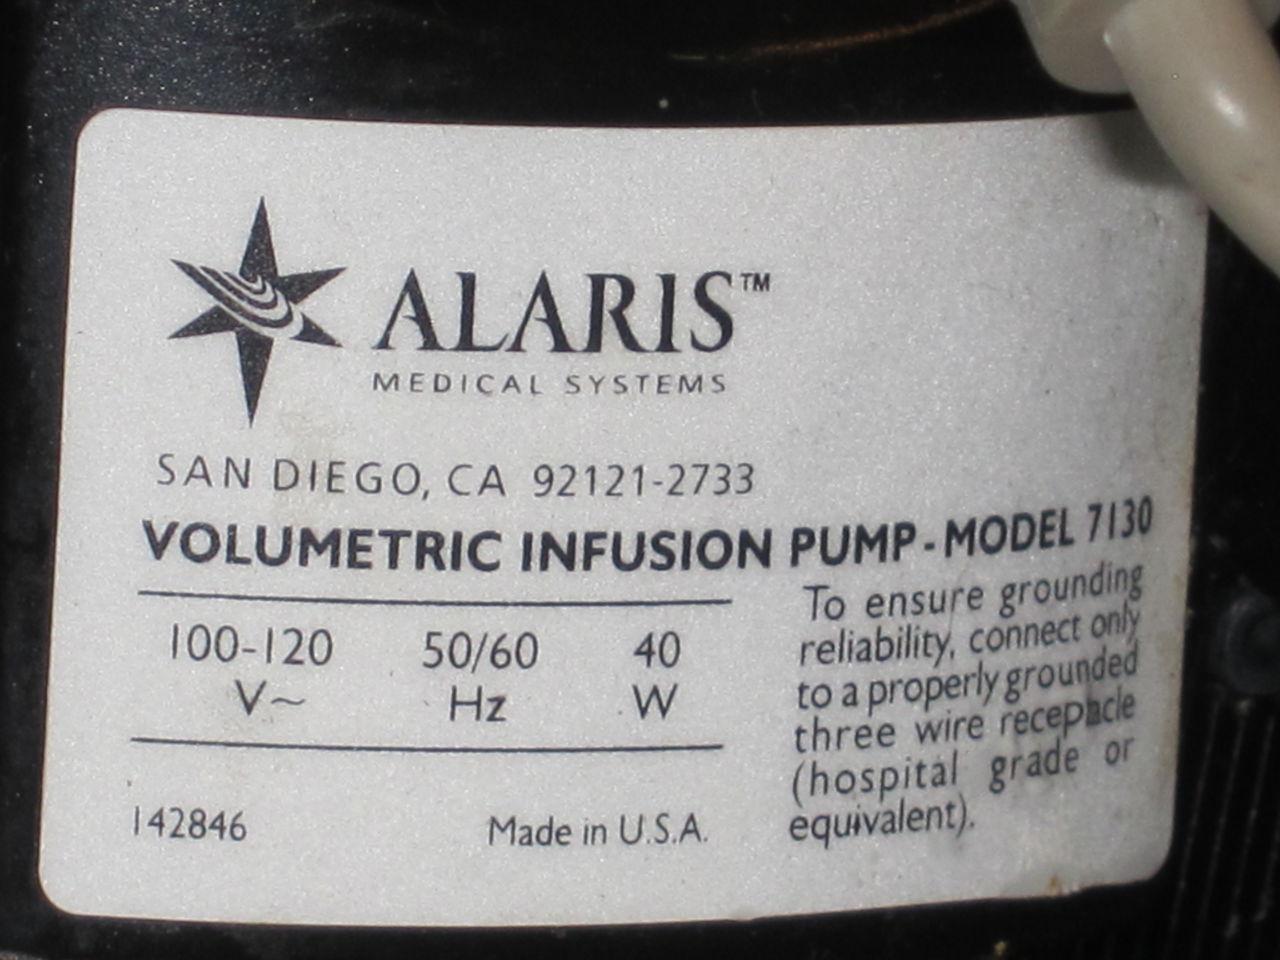 ALARIS 7103B Pump IV Infusion